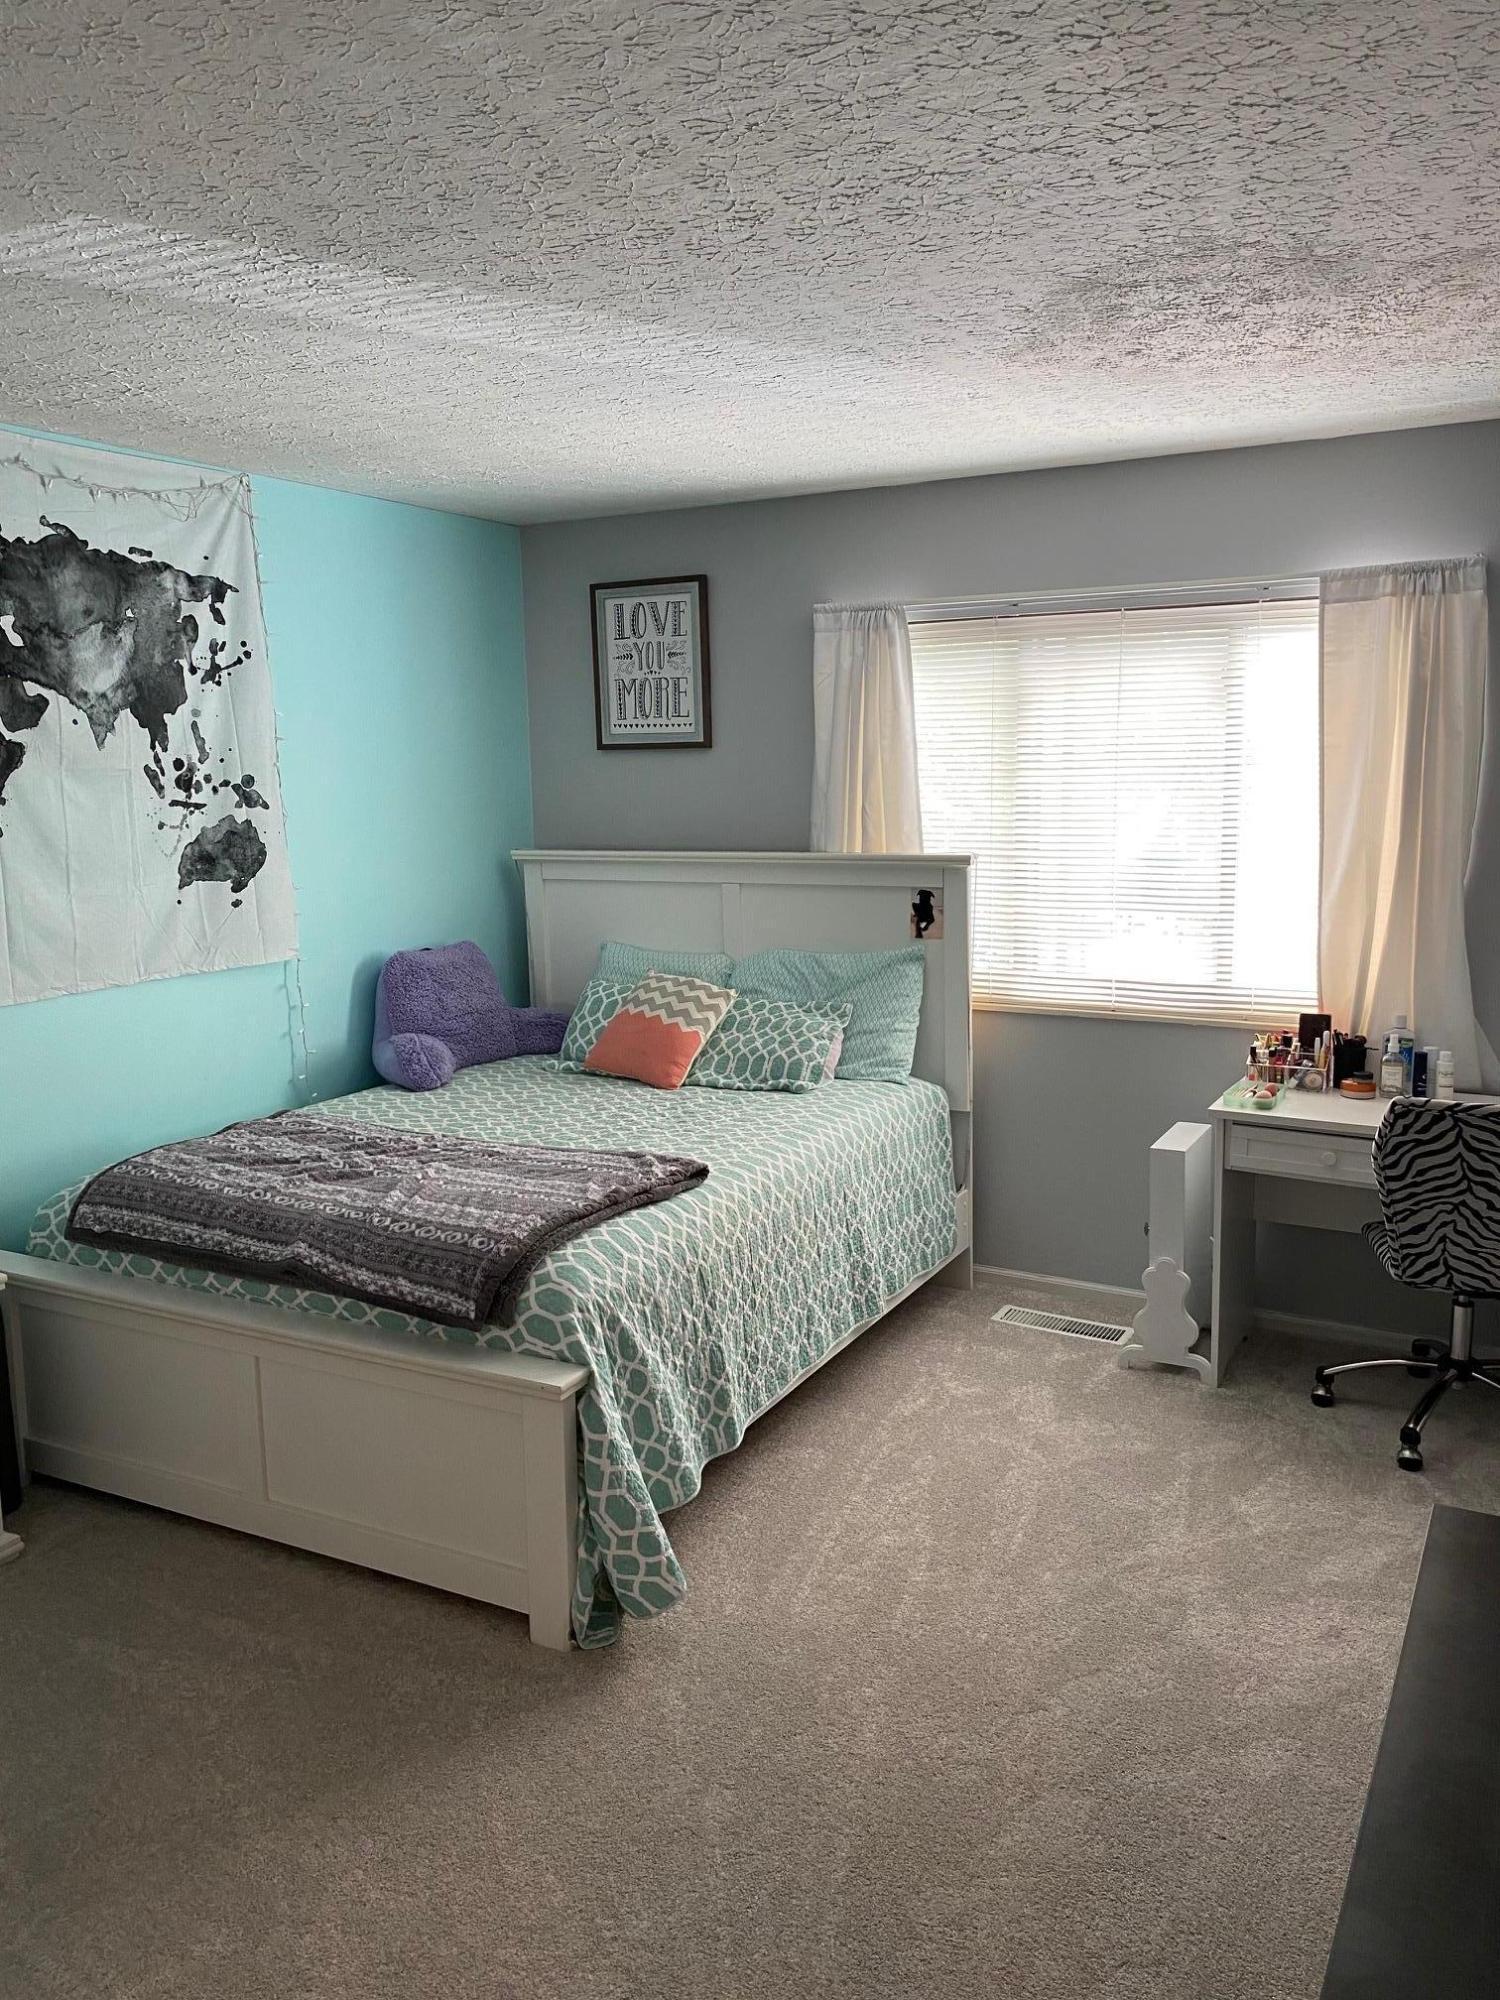 2656 Cedar Lake Drive, Dublin, Ohio 43016, 2 Bedrooms Bedrooms, ,2 BathroomsBathrooms,Residential,For Sale,Cedar Lake,220023723